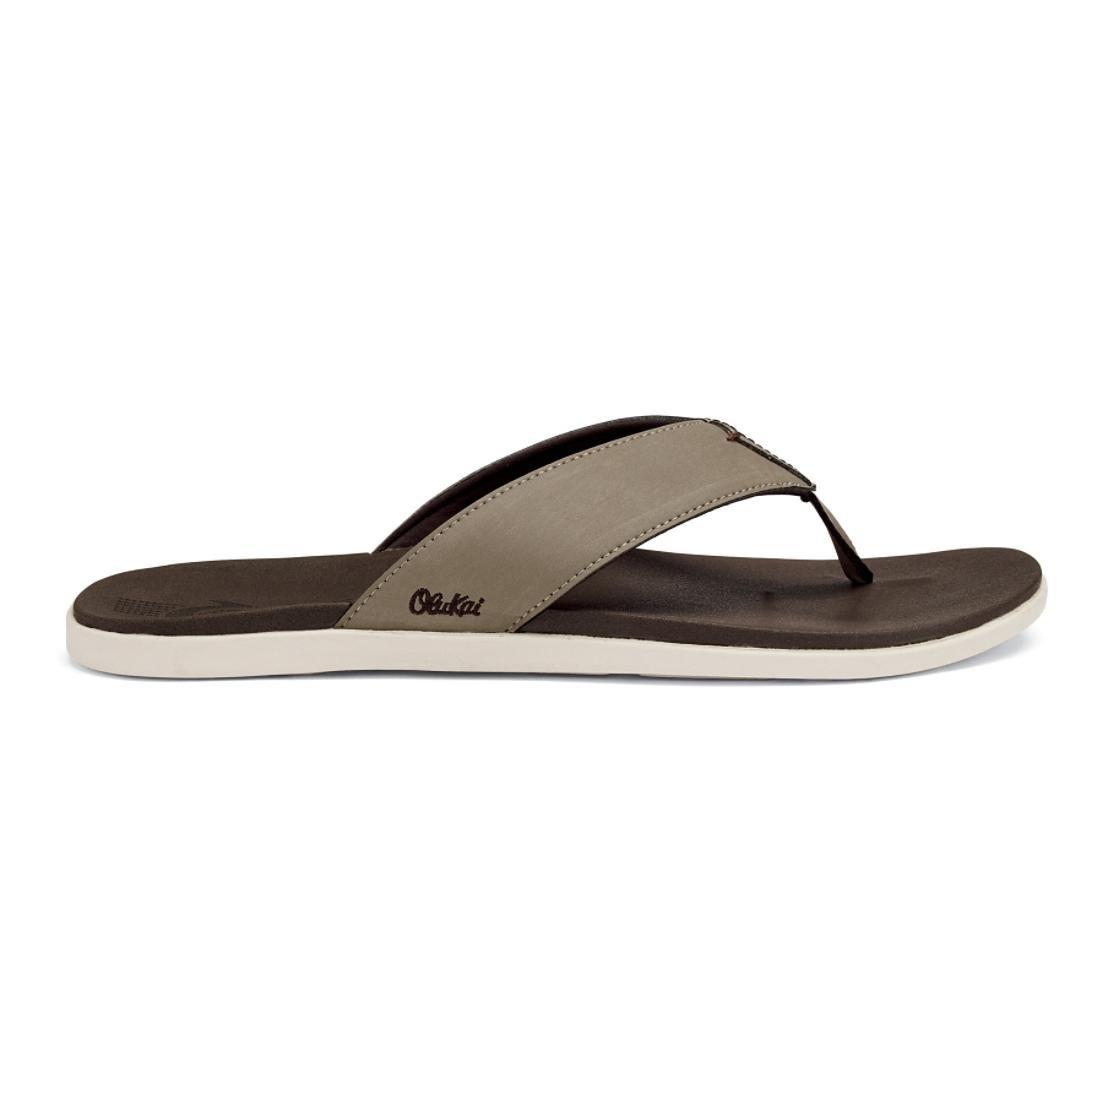 OluKai Men's Holona / Sandale Clay / Holona Dark Java 70ea6e